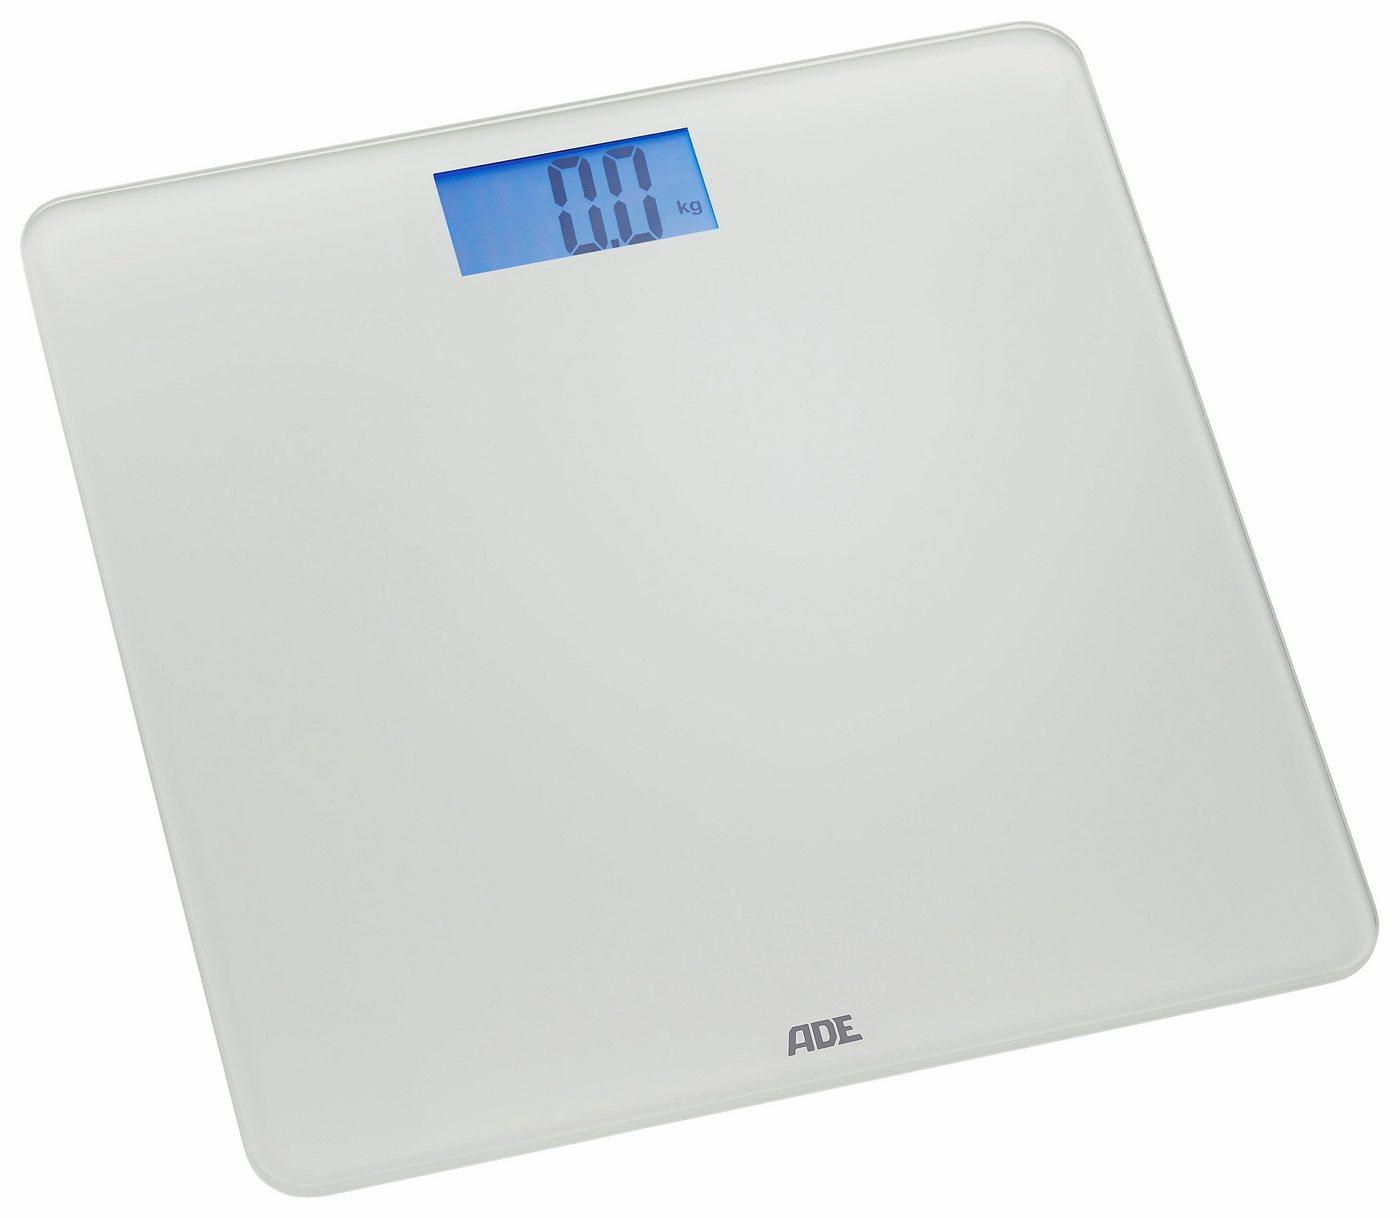 ADE Digitale Personenwaage »BE1507 Lilly«